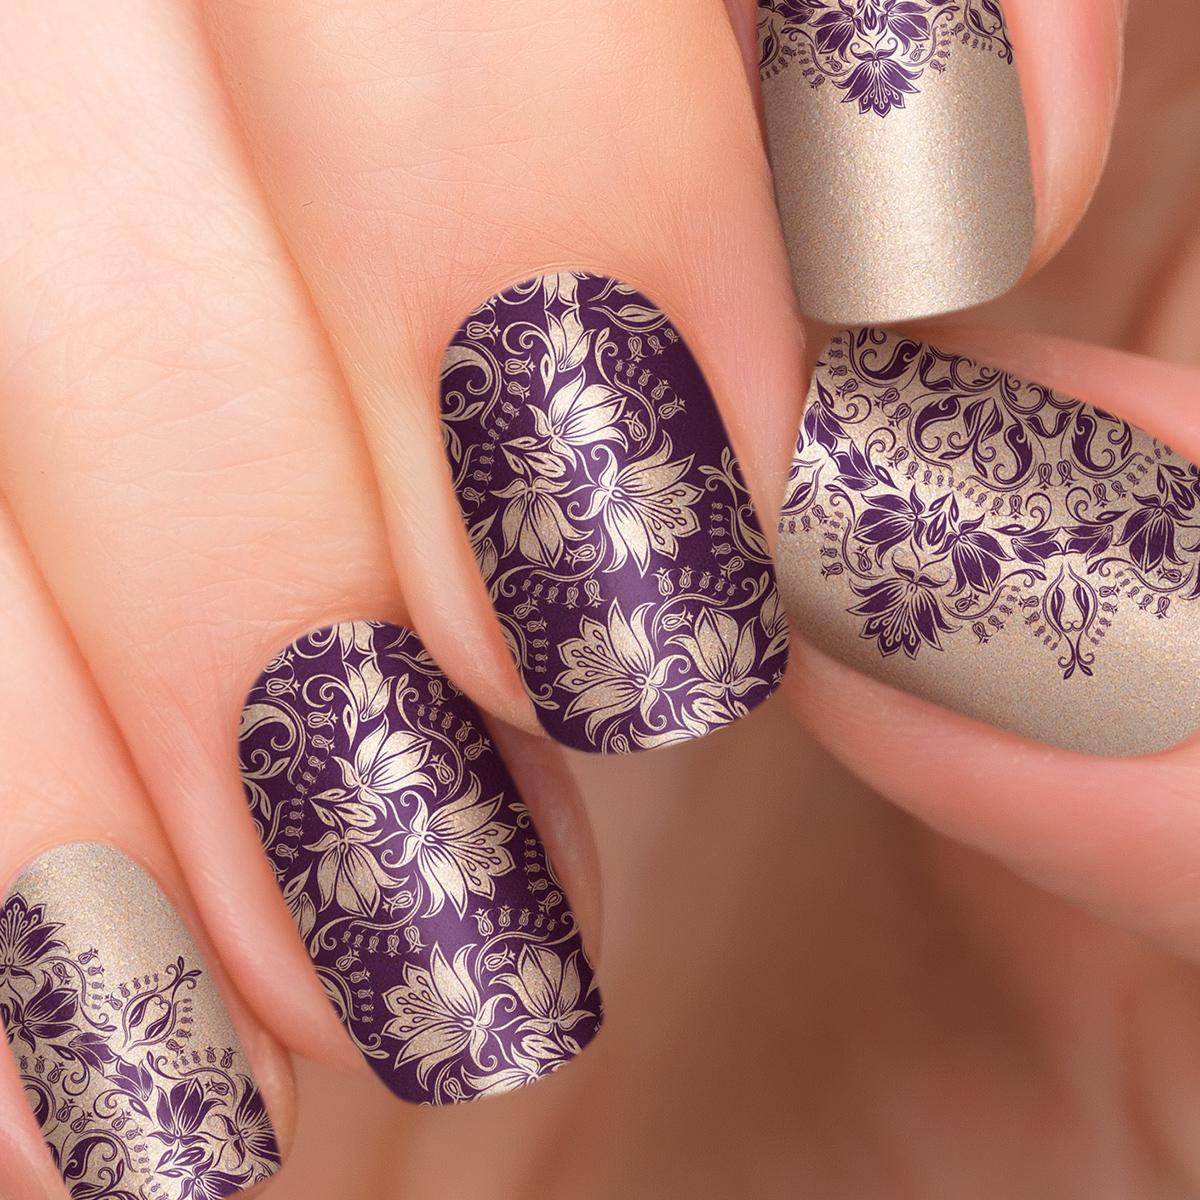 Incoco.com Incoco Nail Polish Strips, Duchess